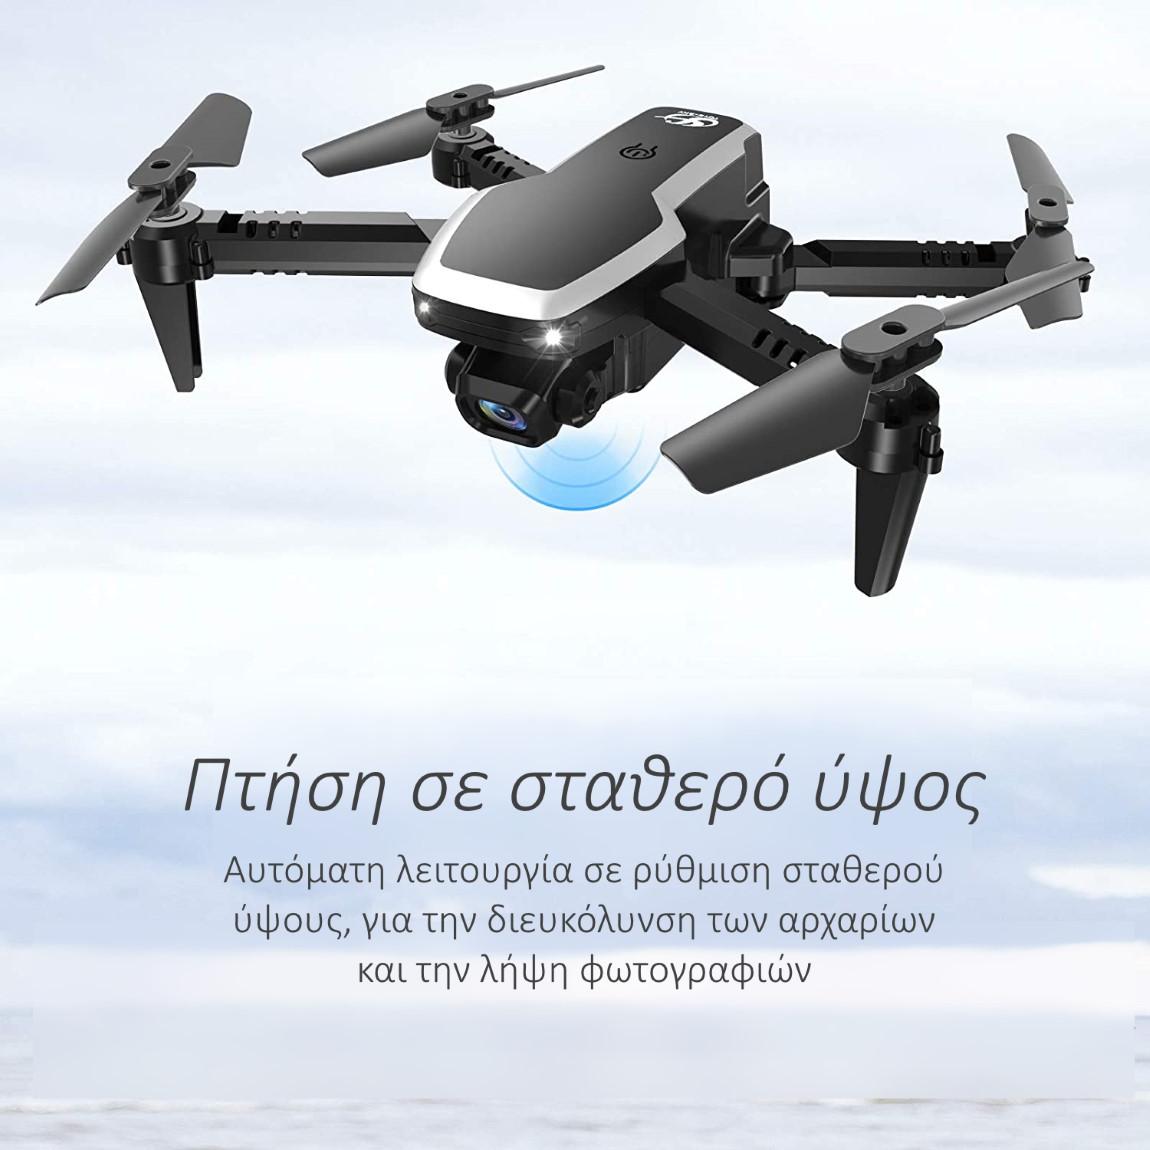 ToySky S171 Αναδιπλούμενο Mini Drone Quadcopter πτήση σταθερού ύψους